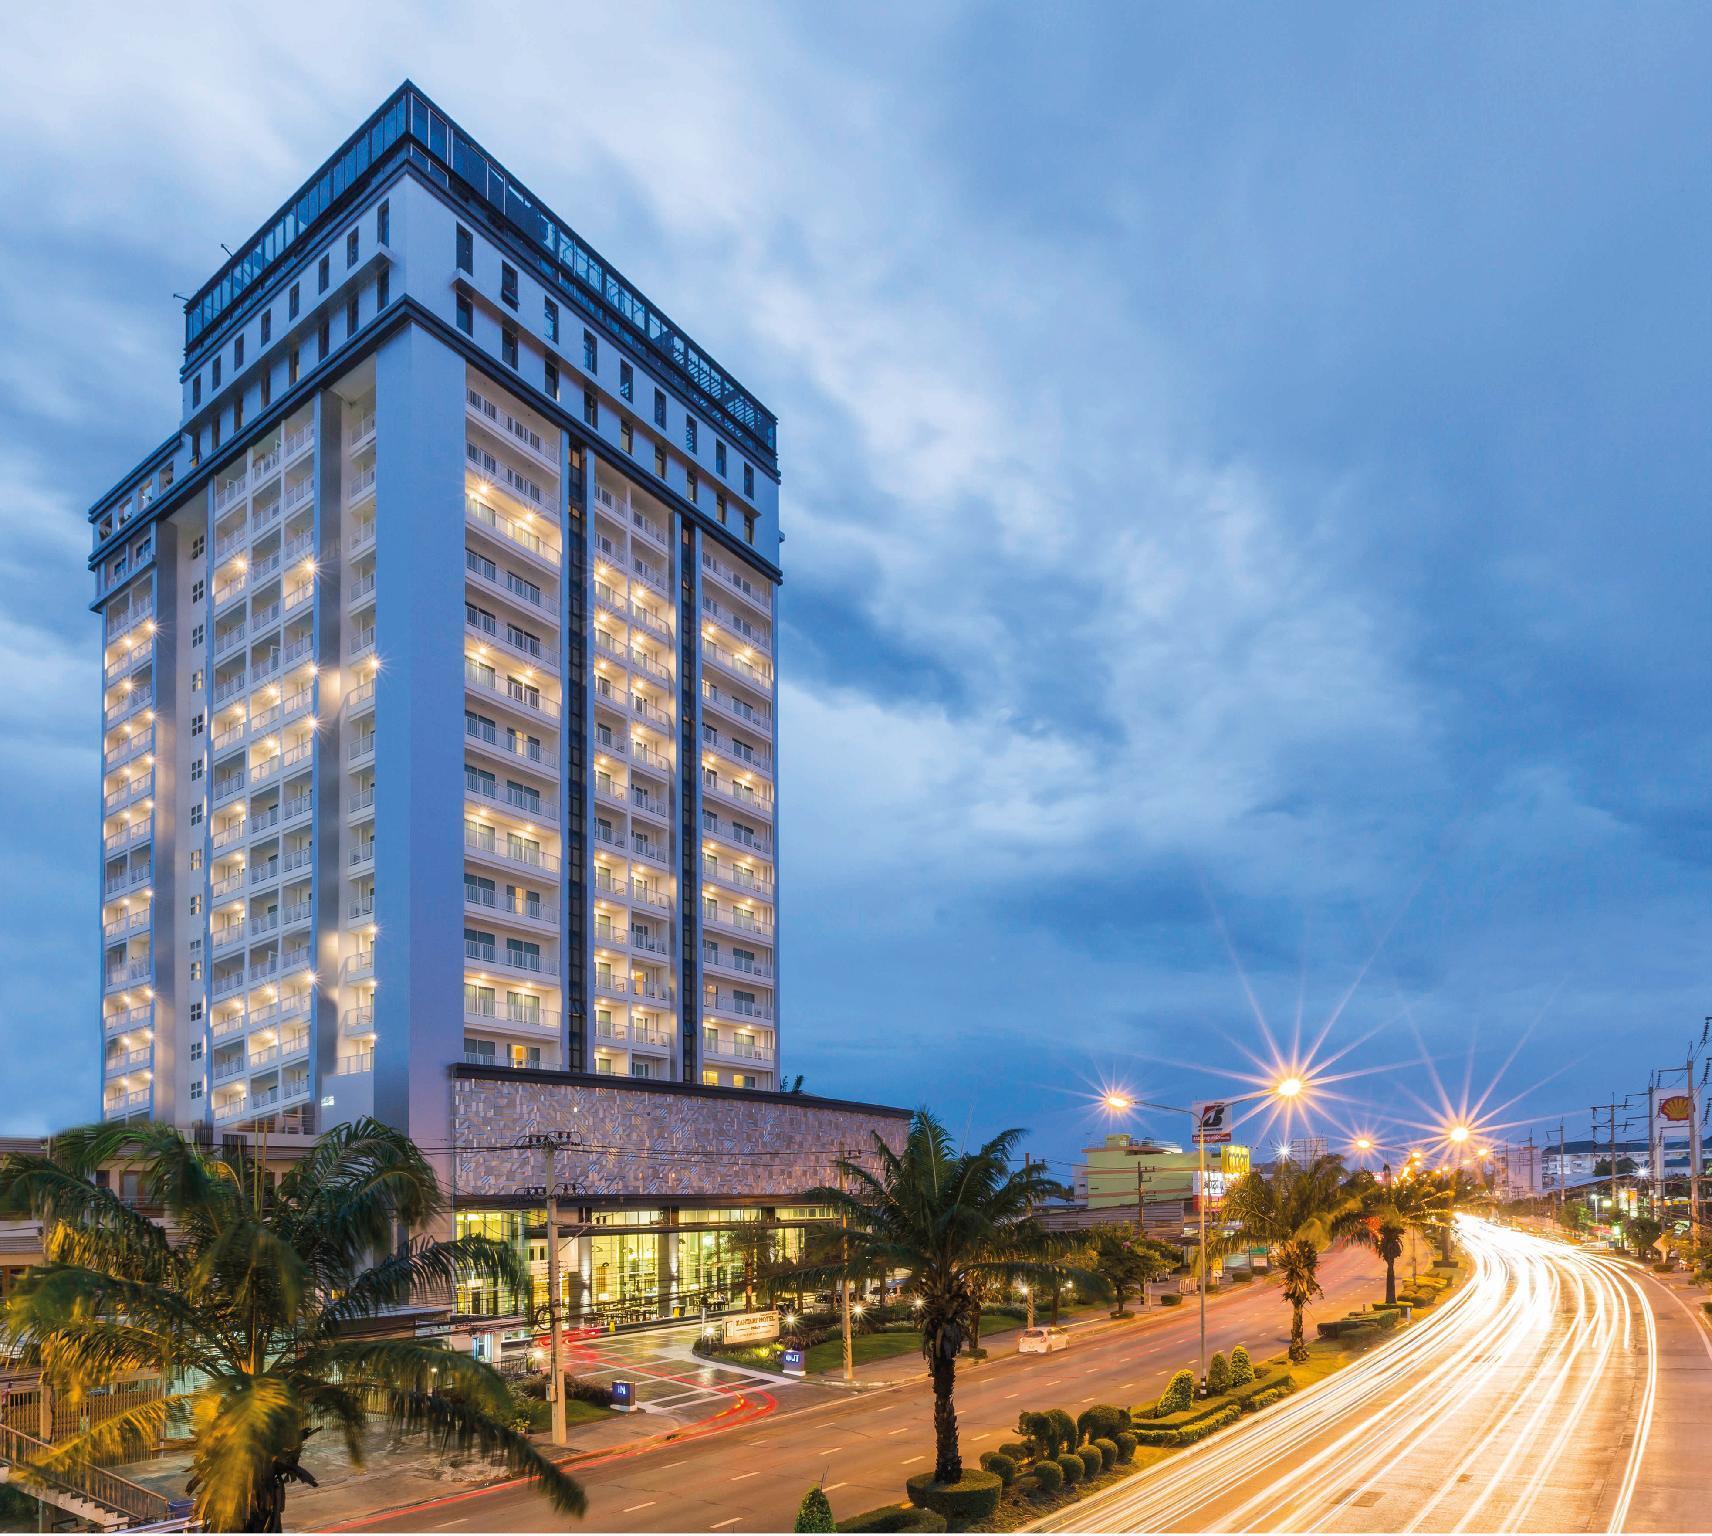 Kantary Hotel & Serviced Apartment Korat - Nakhonratchasima